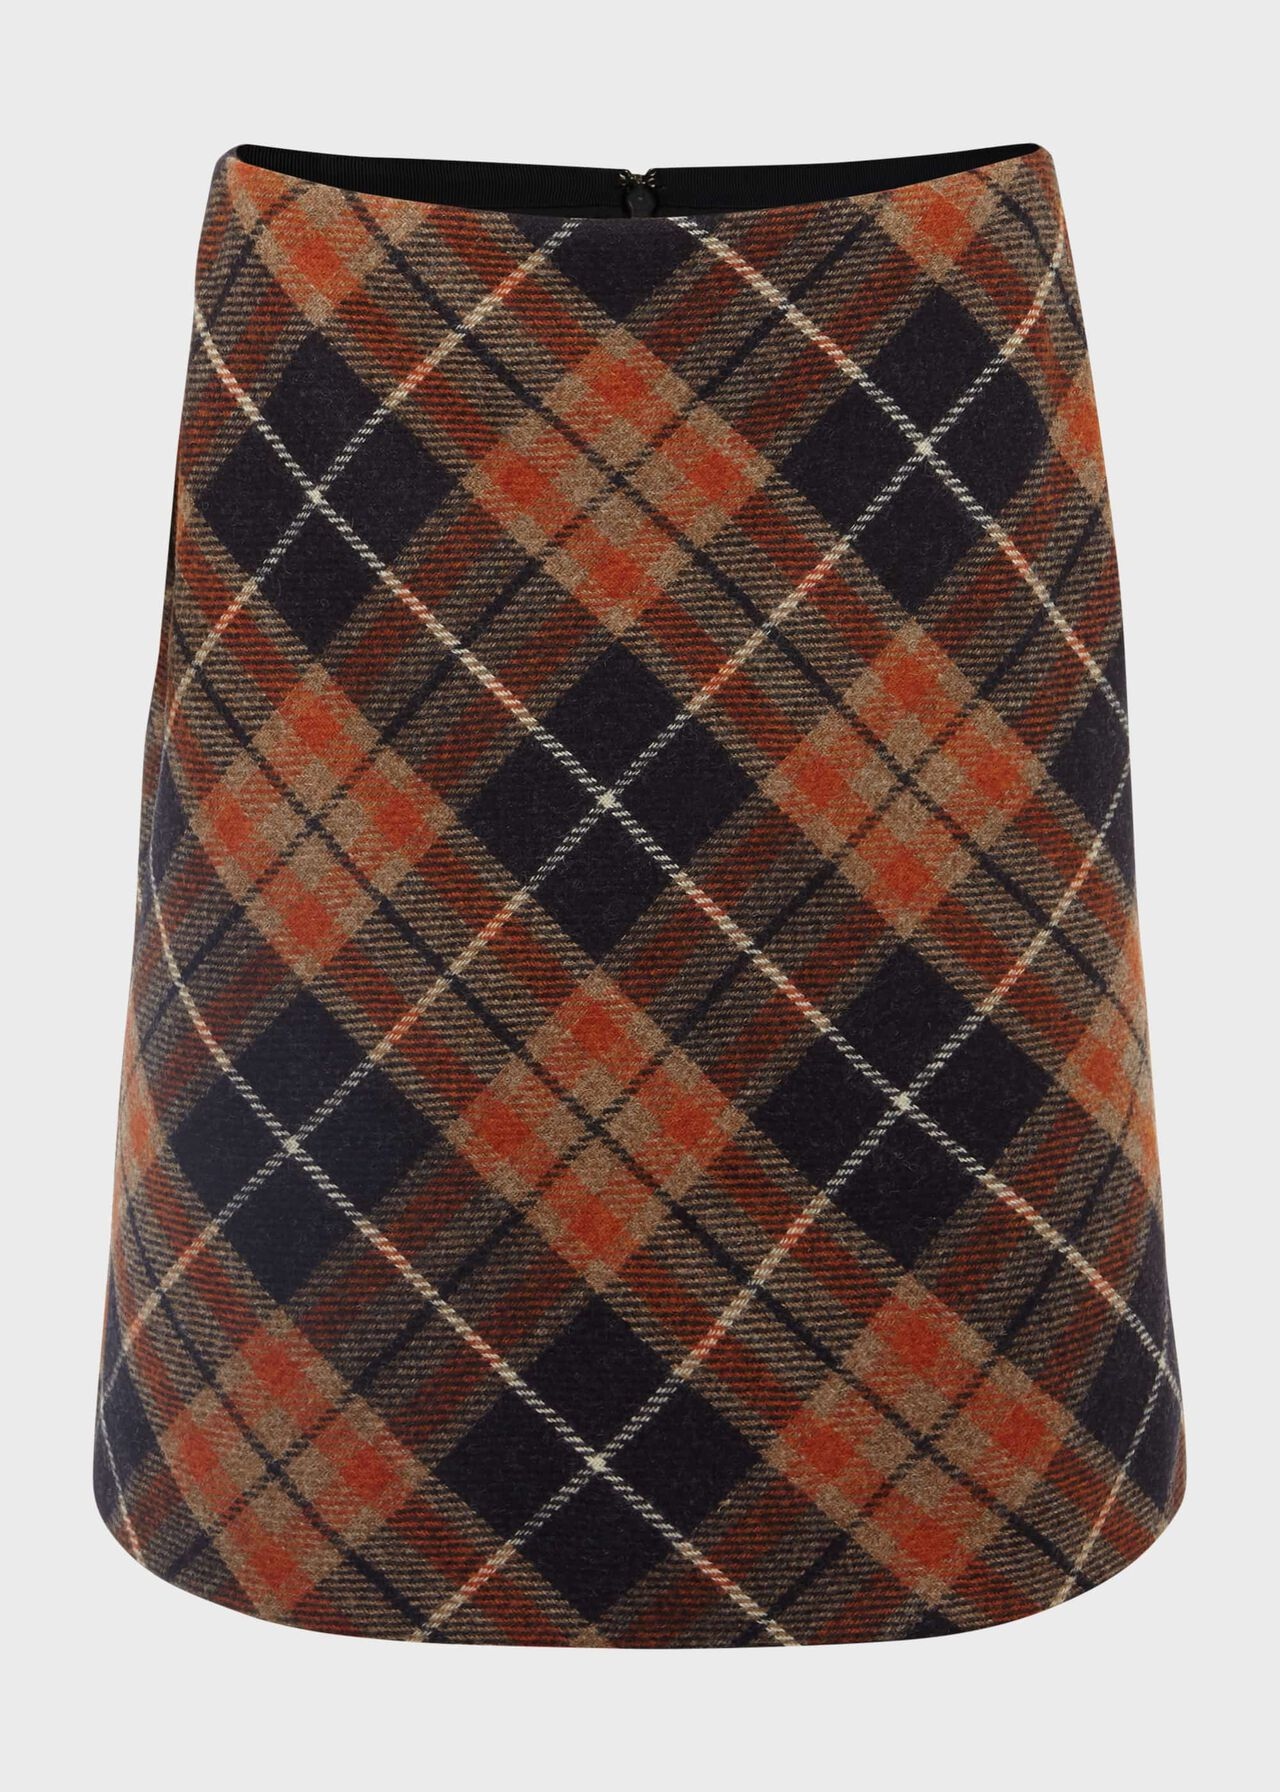 Elea Wool Check A Line Skirt Orange Camel